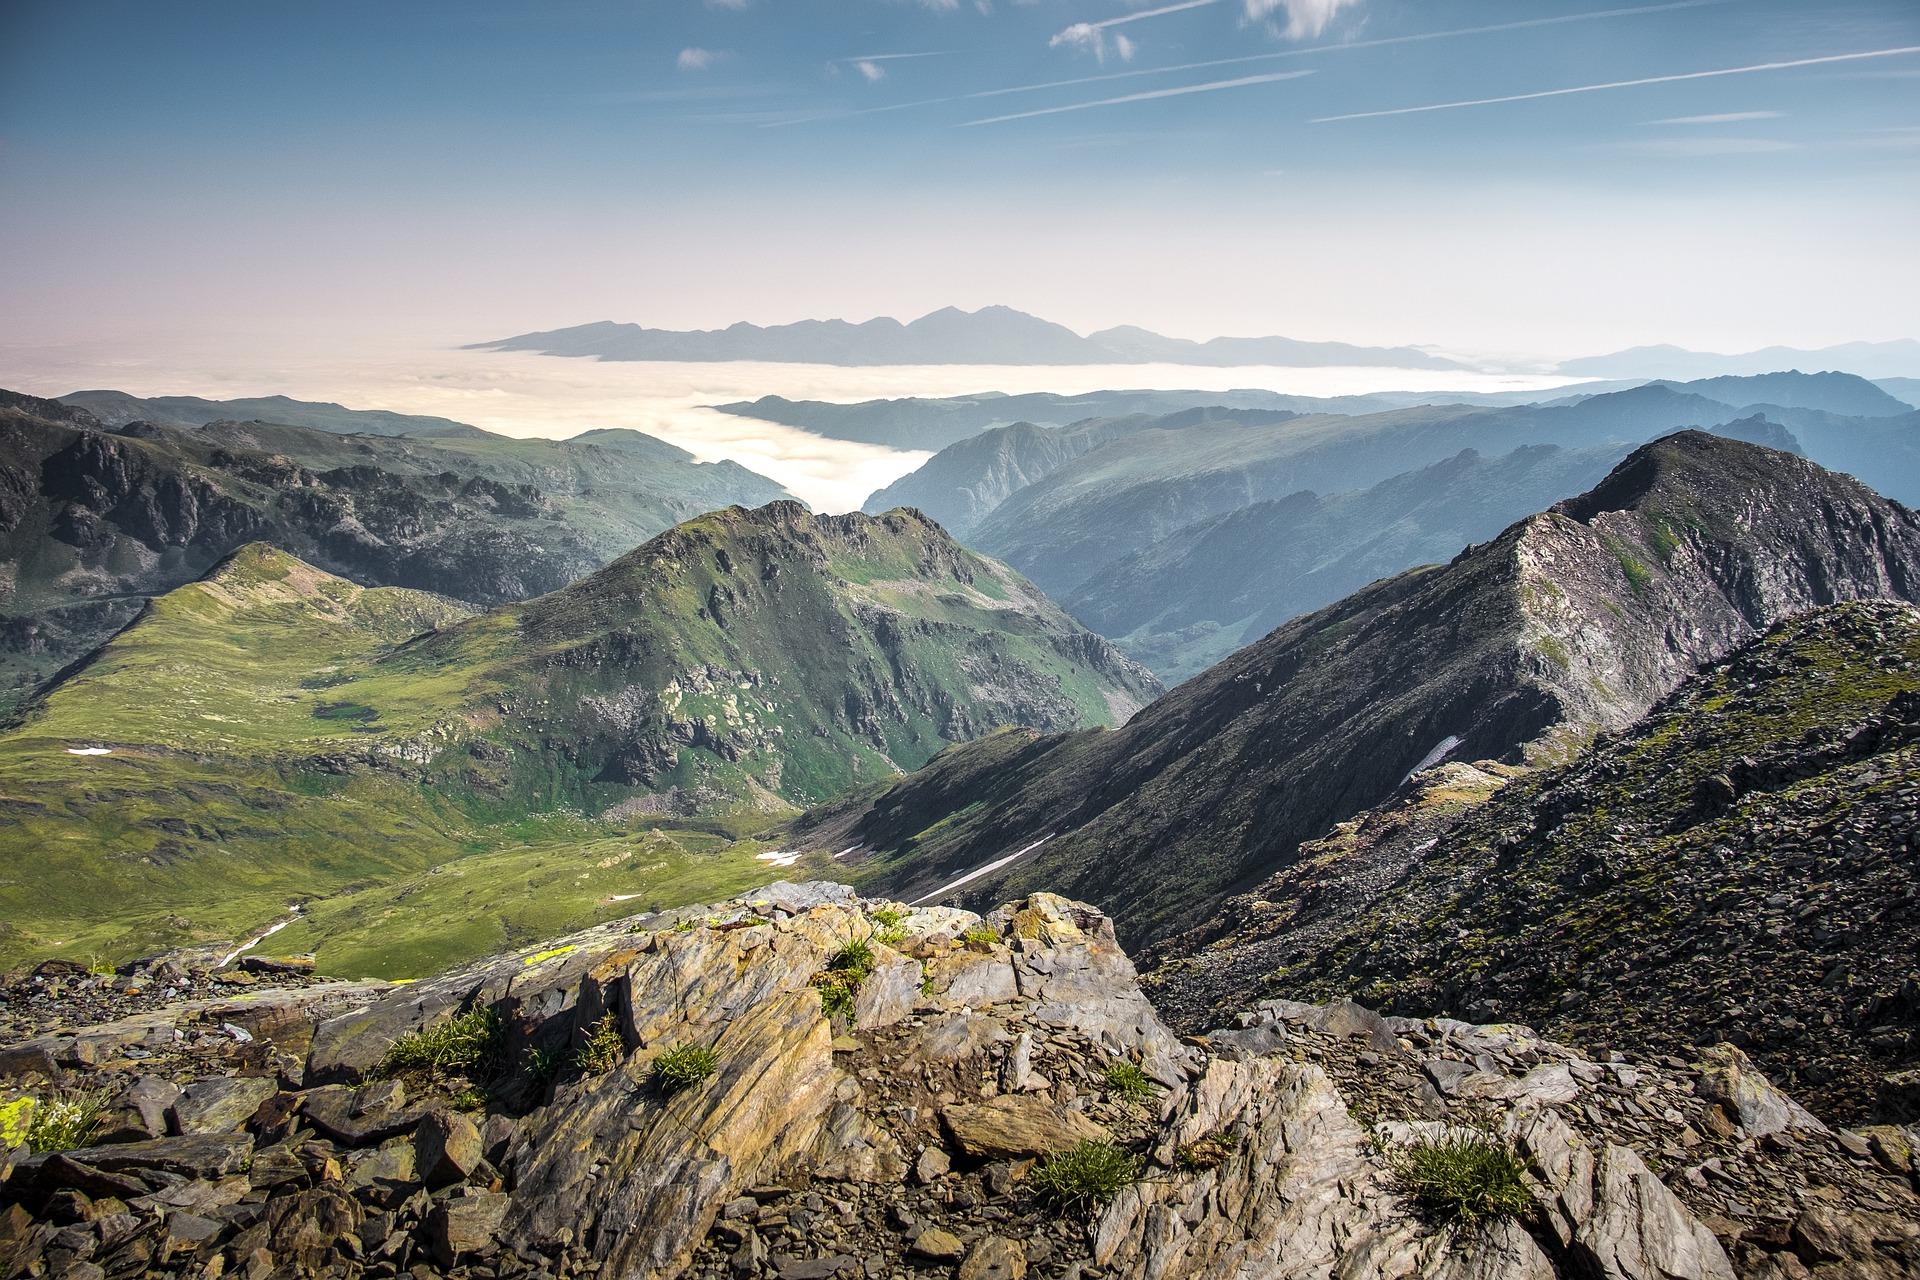 Main image of article: Les destinations nature